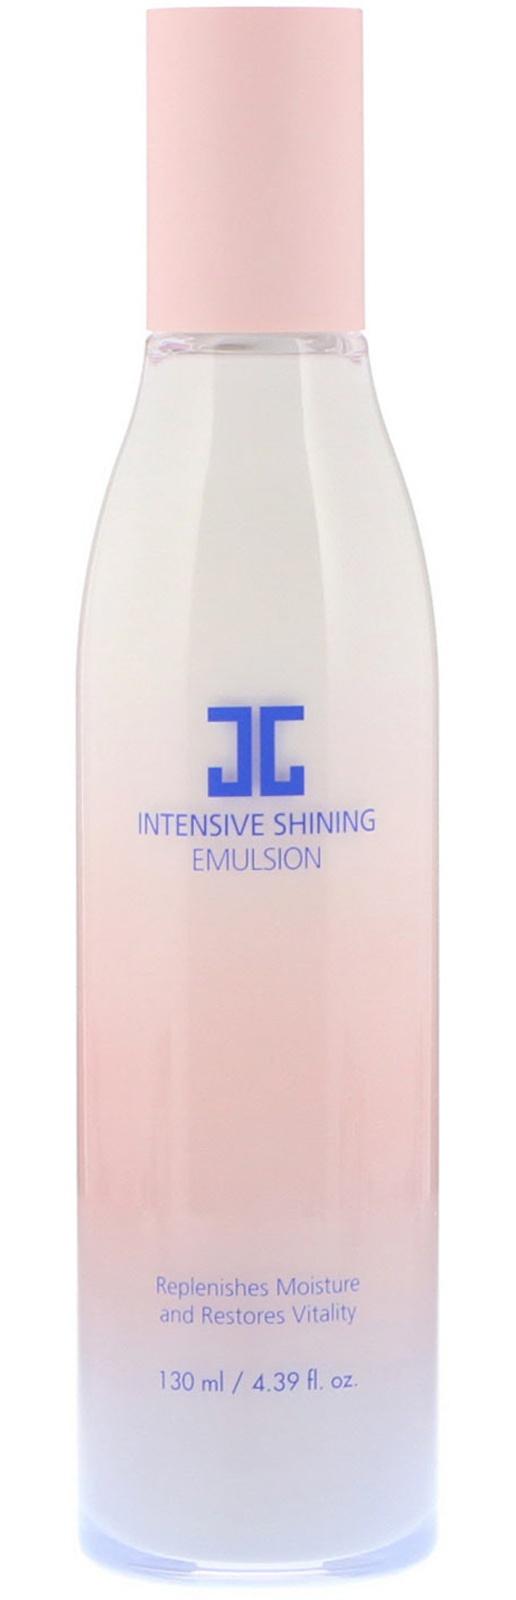 JAYJUN Intensive Shining Emulsion